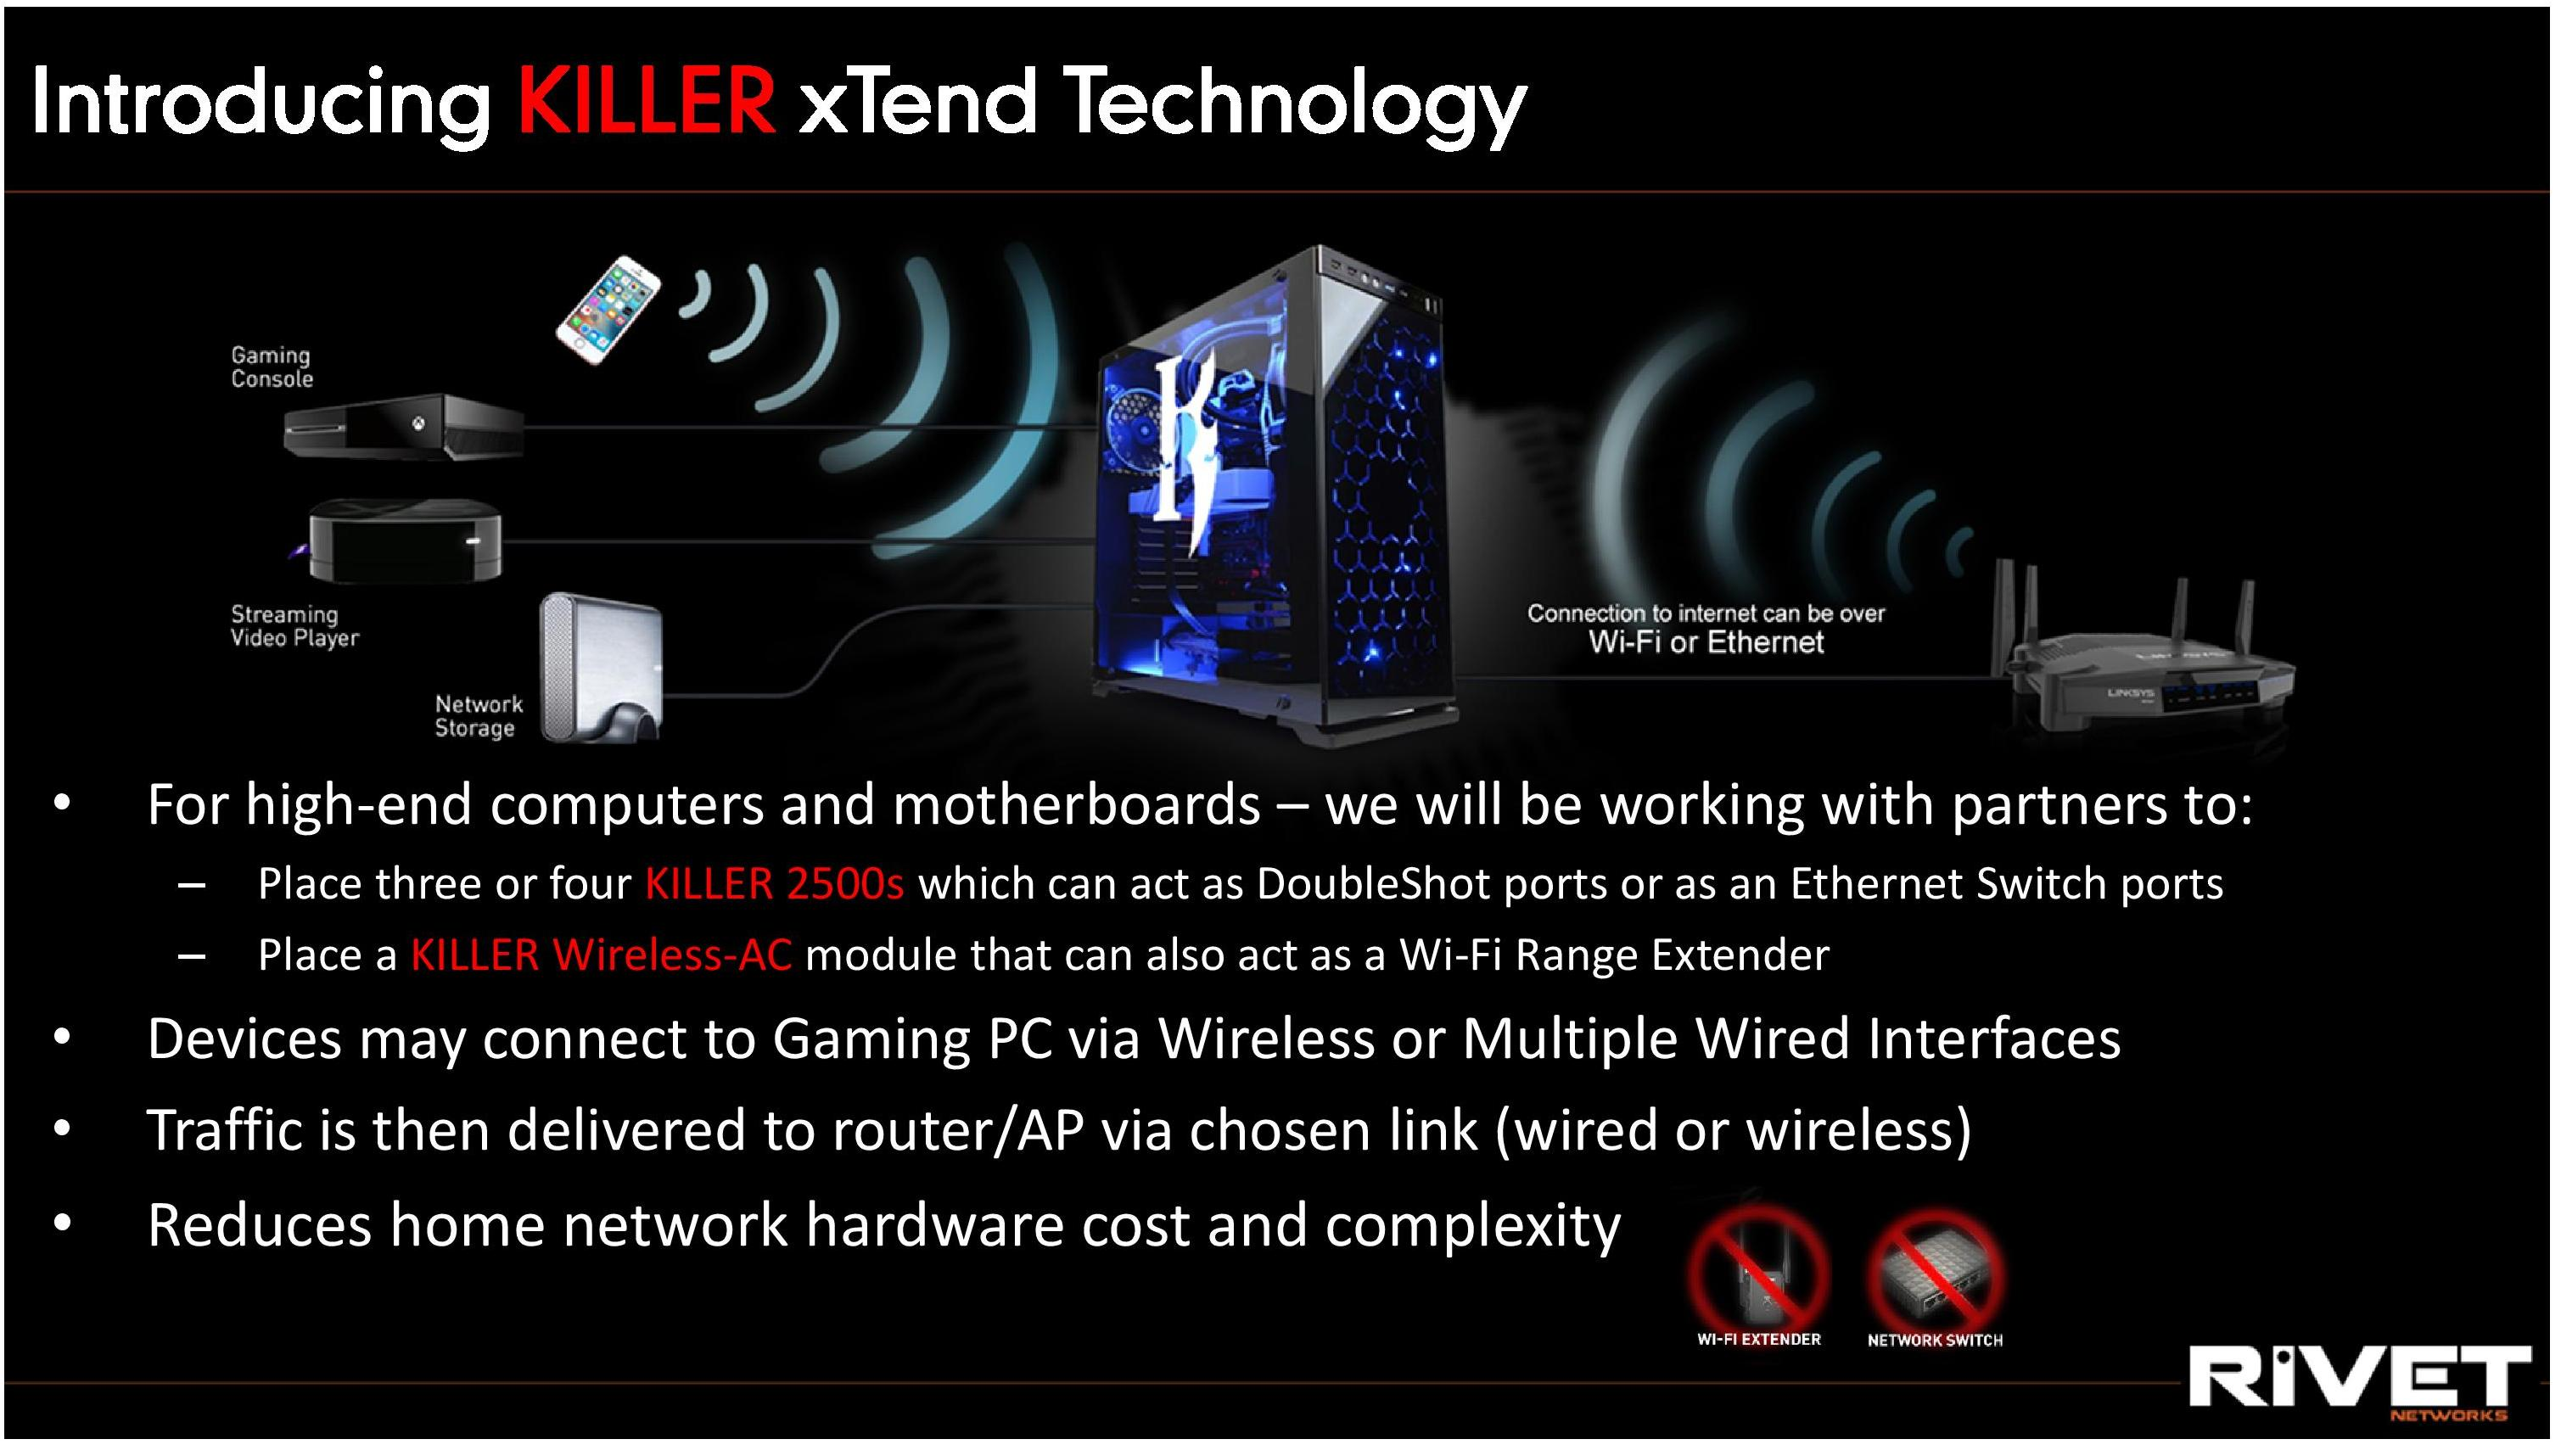 QUALCOMM KILLER NETWORK WINDOWS XP DRIVER DOWNLOAD